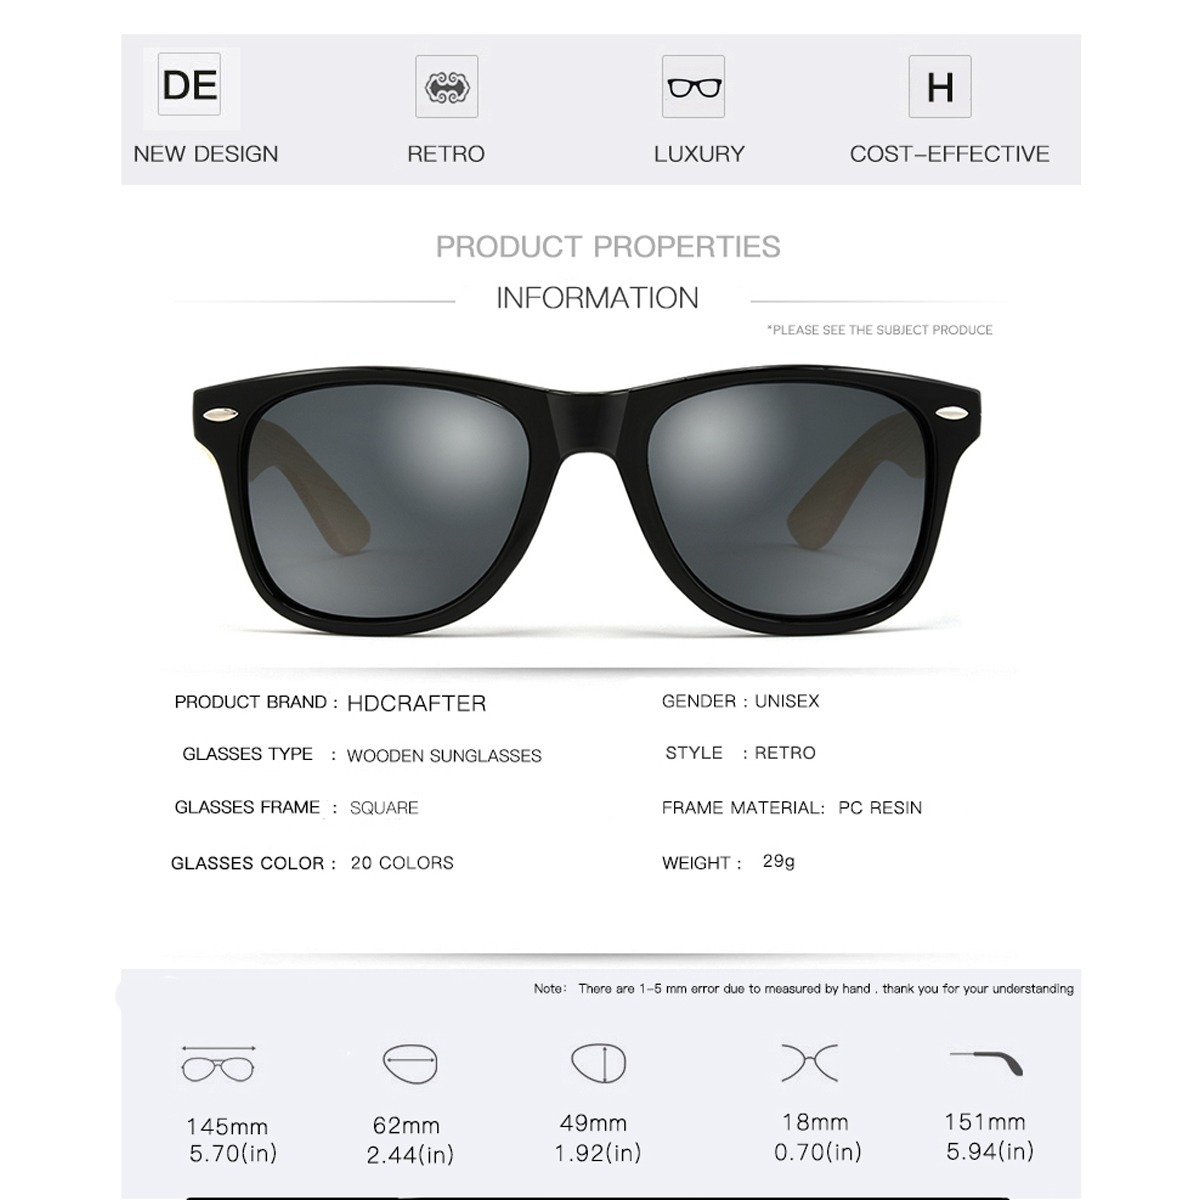 2a0b4a816e845 óculos sol masculino exclusive hd case geometric menor preço. Carregando  zoom.